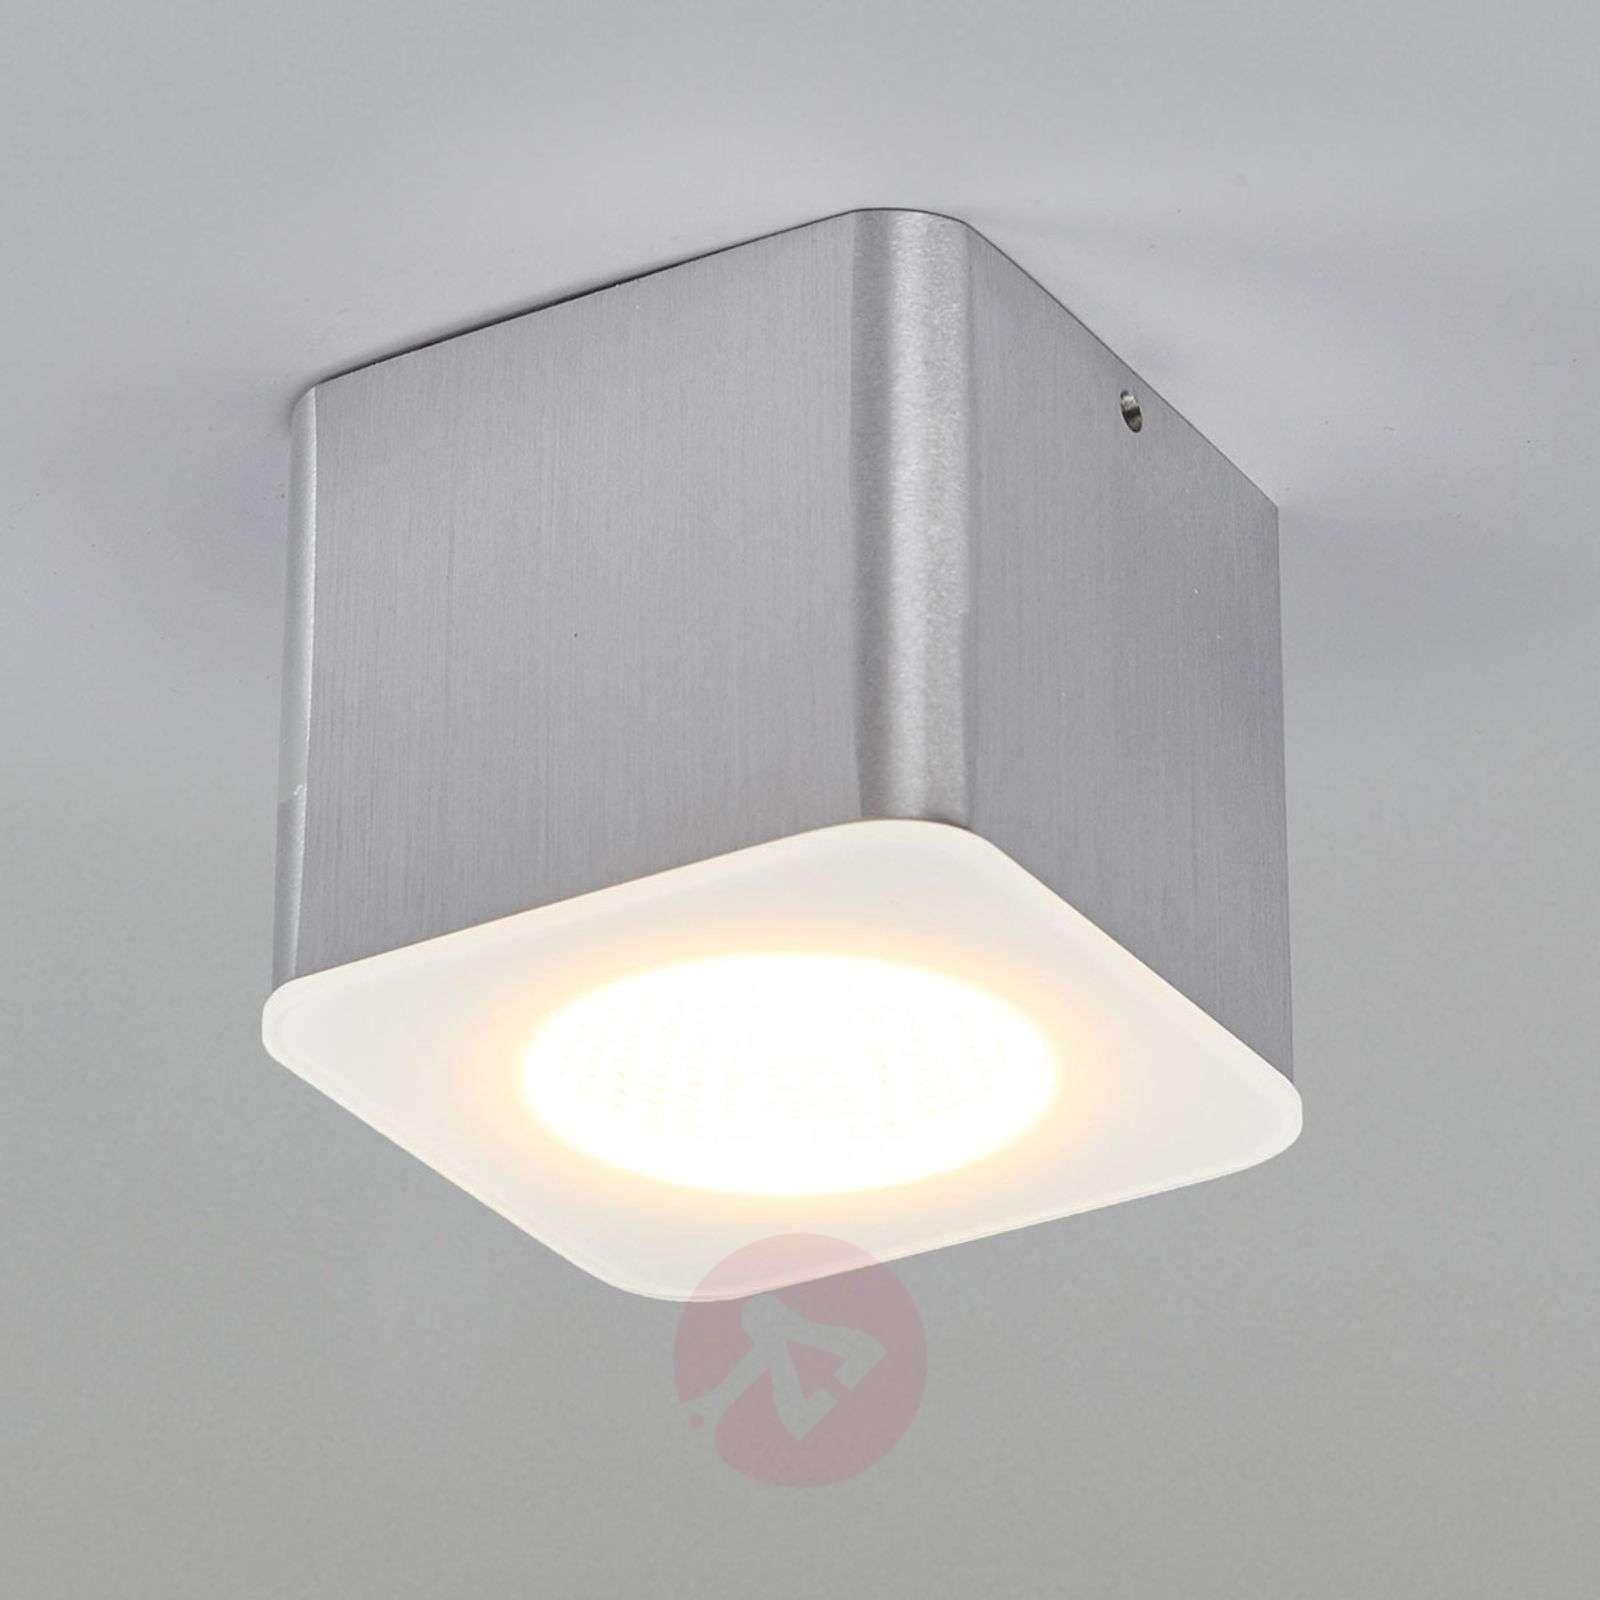 Helestra Oso LED kulmikas, matta alumiini-4516445-01